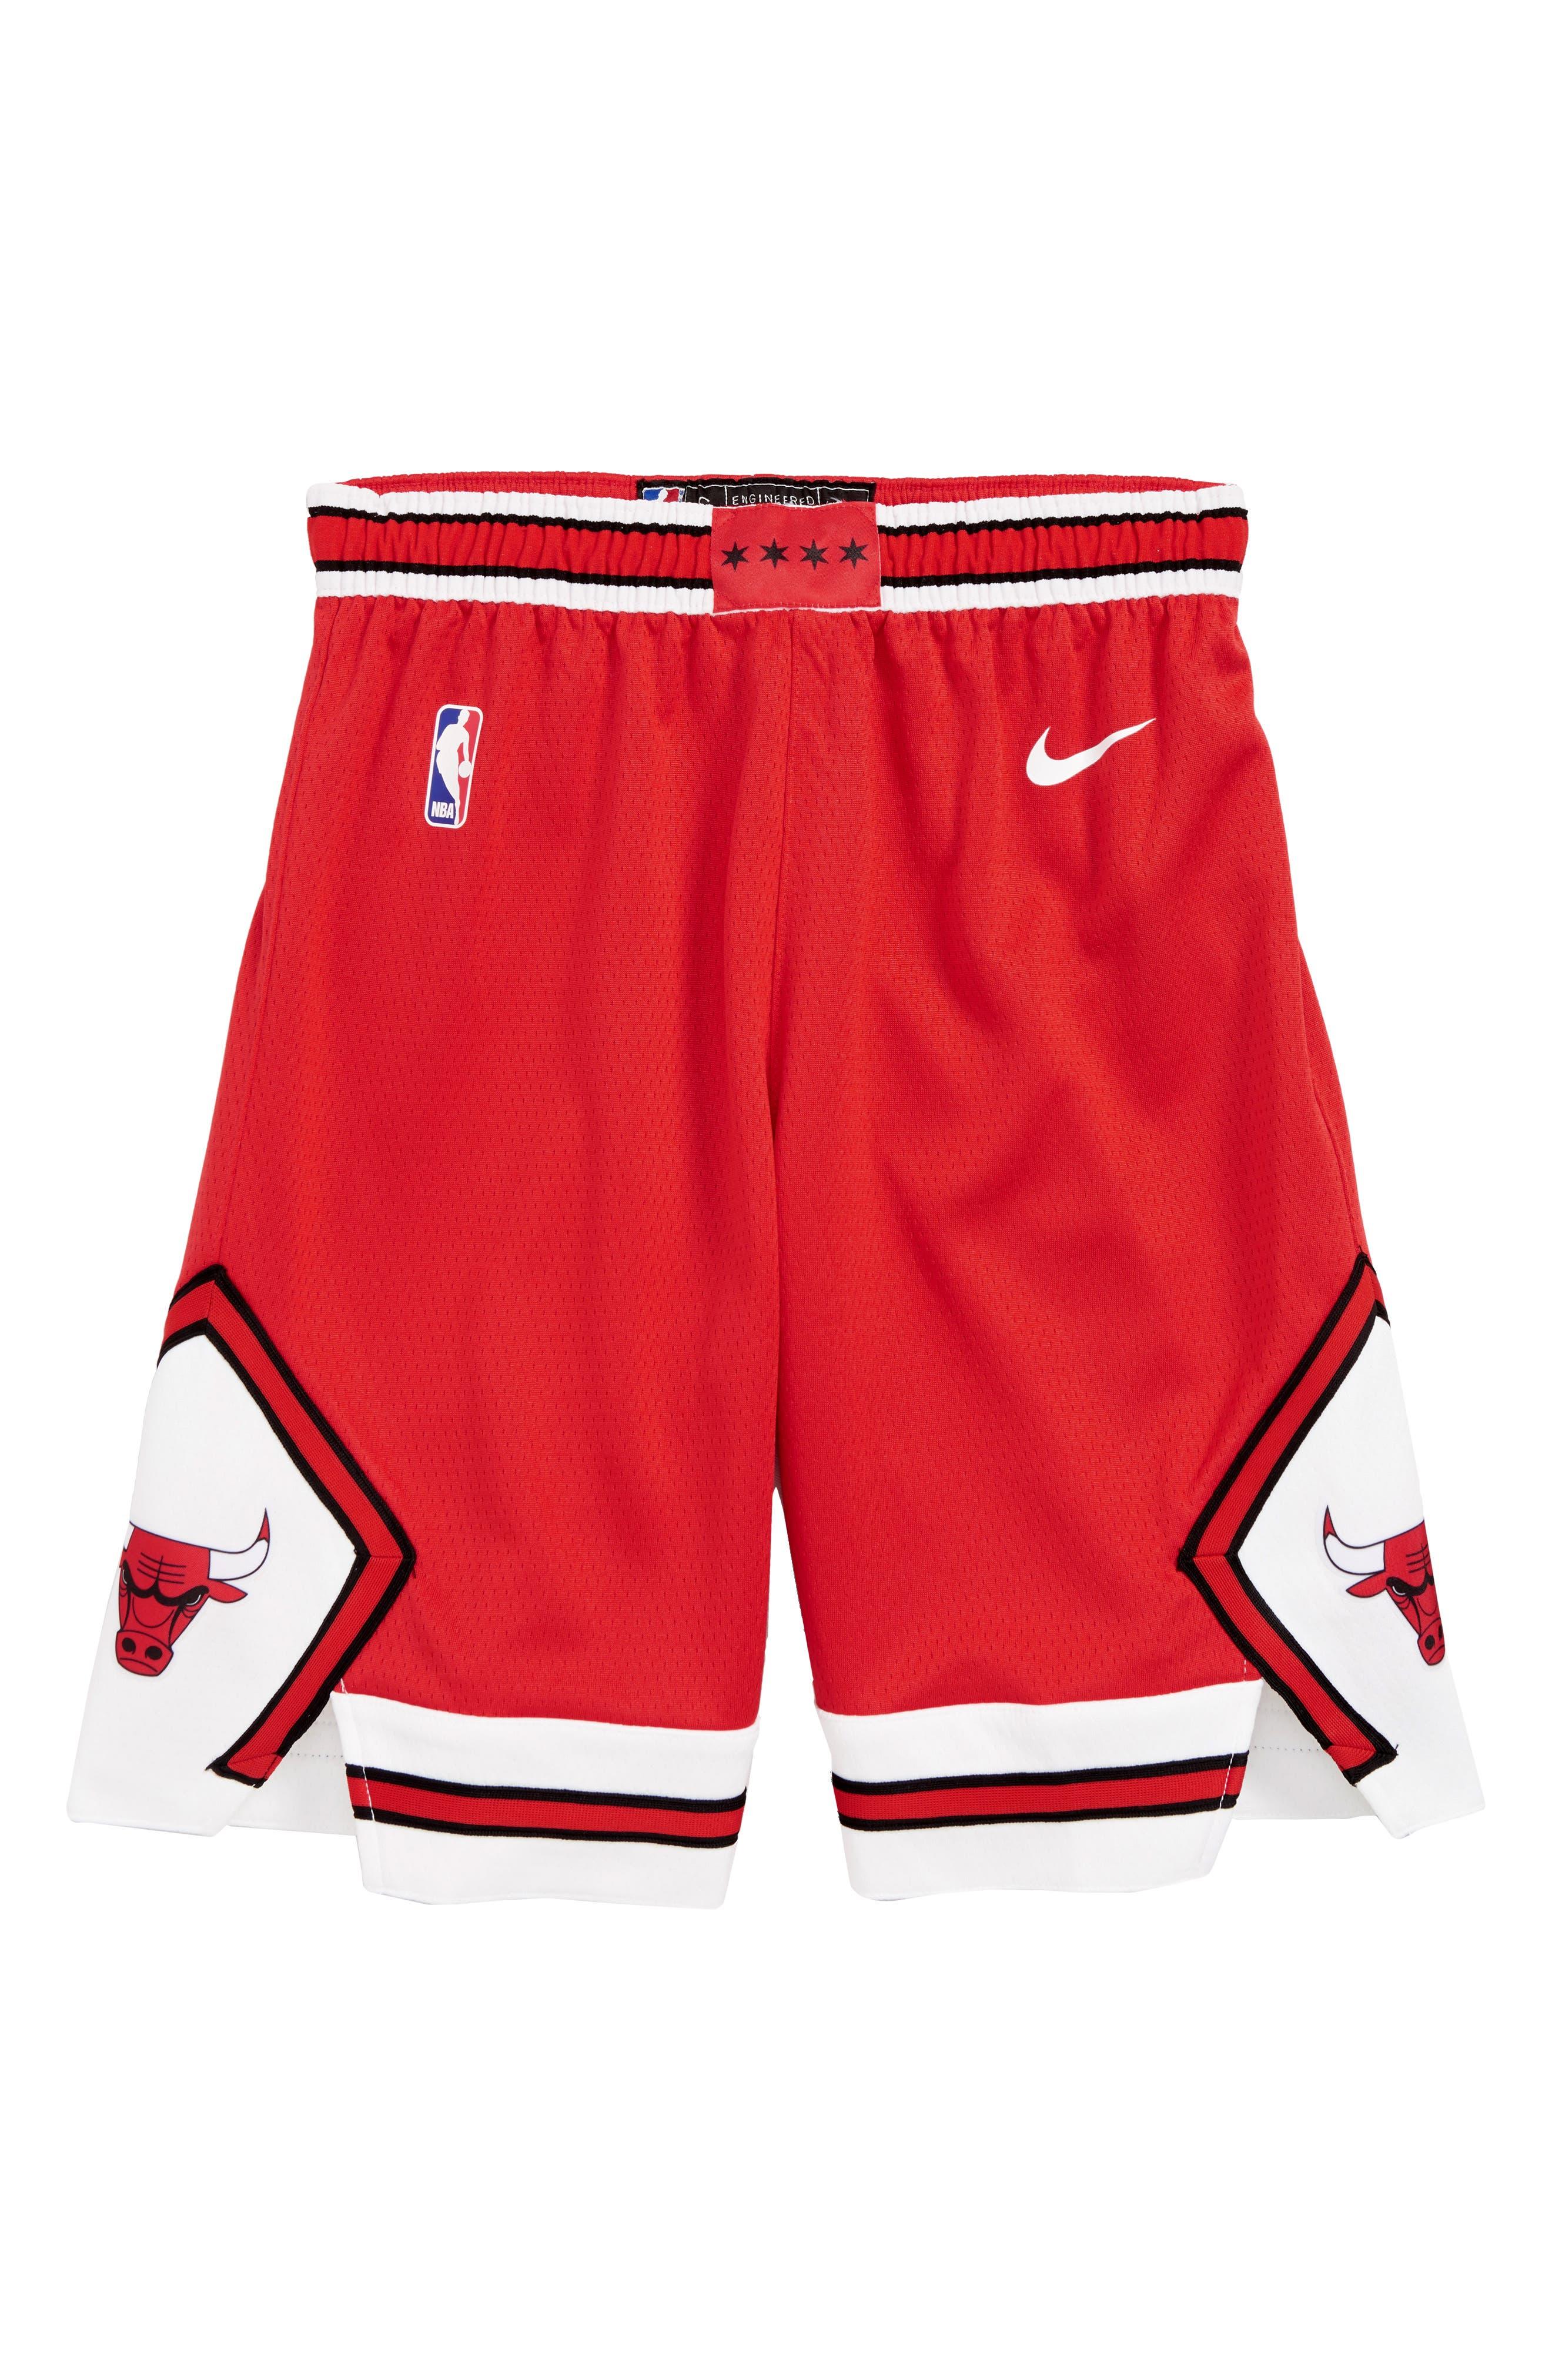 NIKE Icon Chicago Bulls Basketball Shorts, Main, color, UNIVERSITY RED